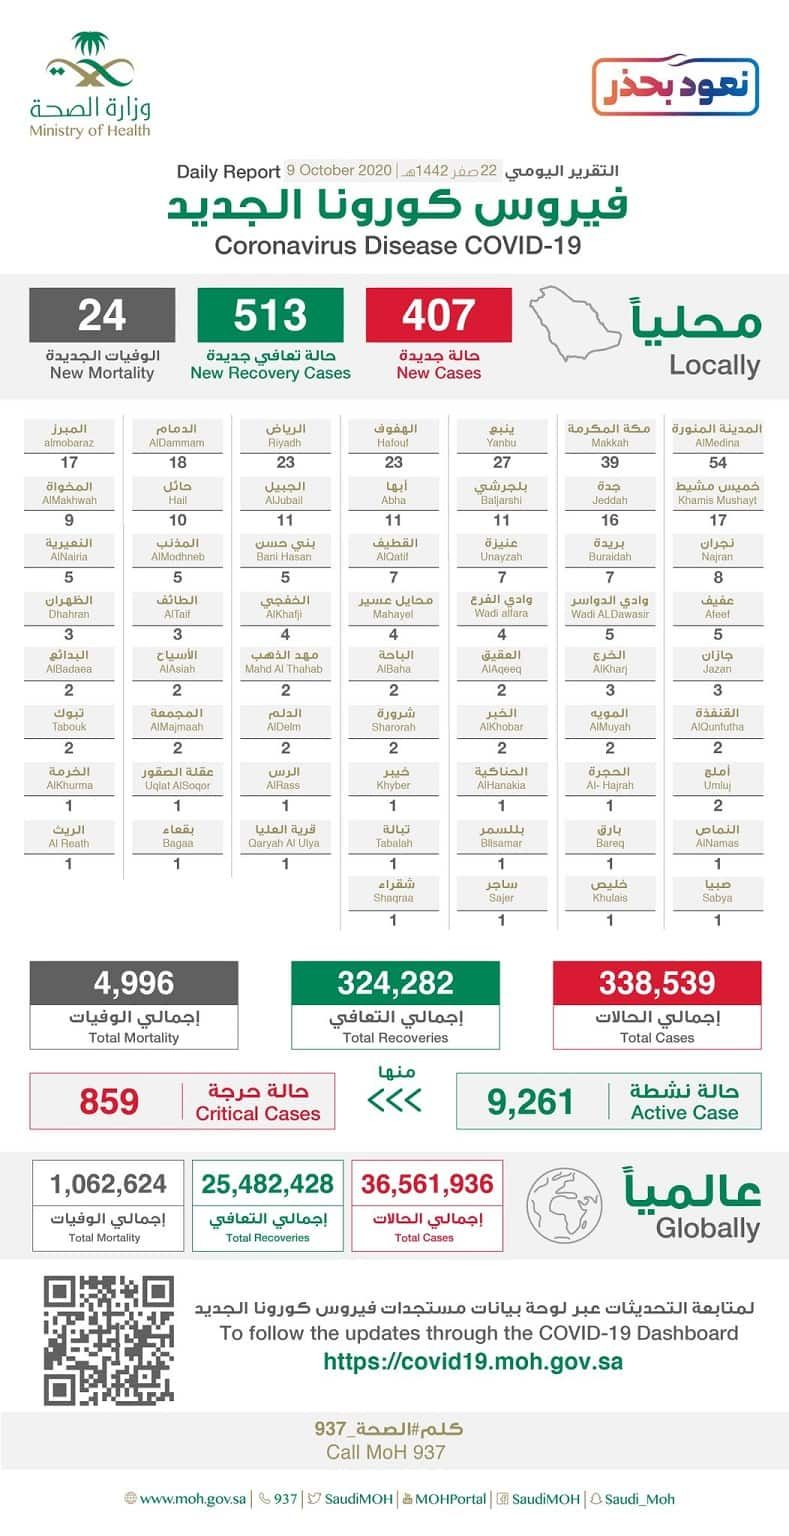 Pin By Saudi Expatriates Com On Saudi Arabia 2021 2020 Life In Saudi Arabia Recovery Posts Corona